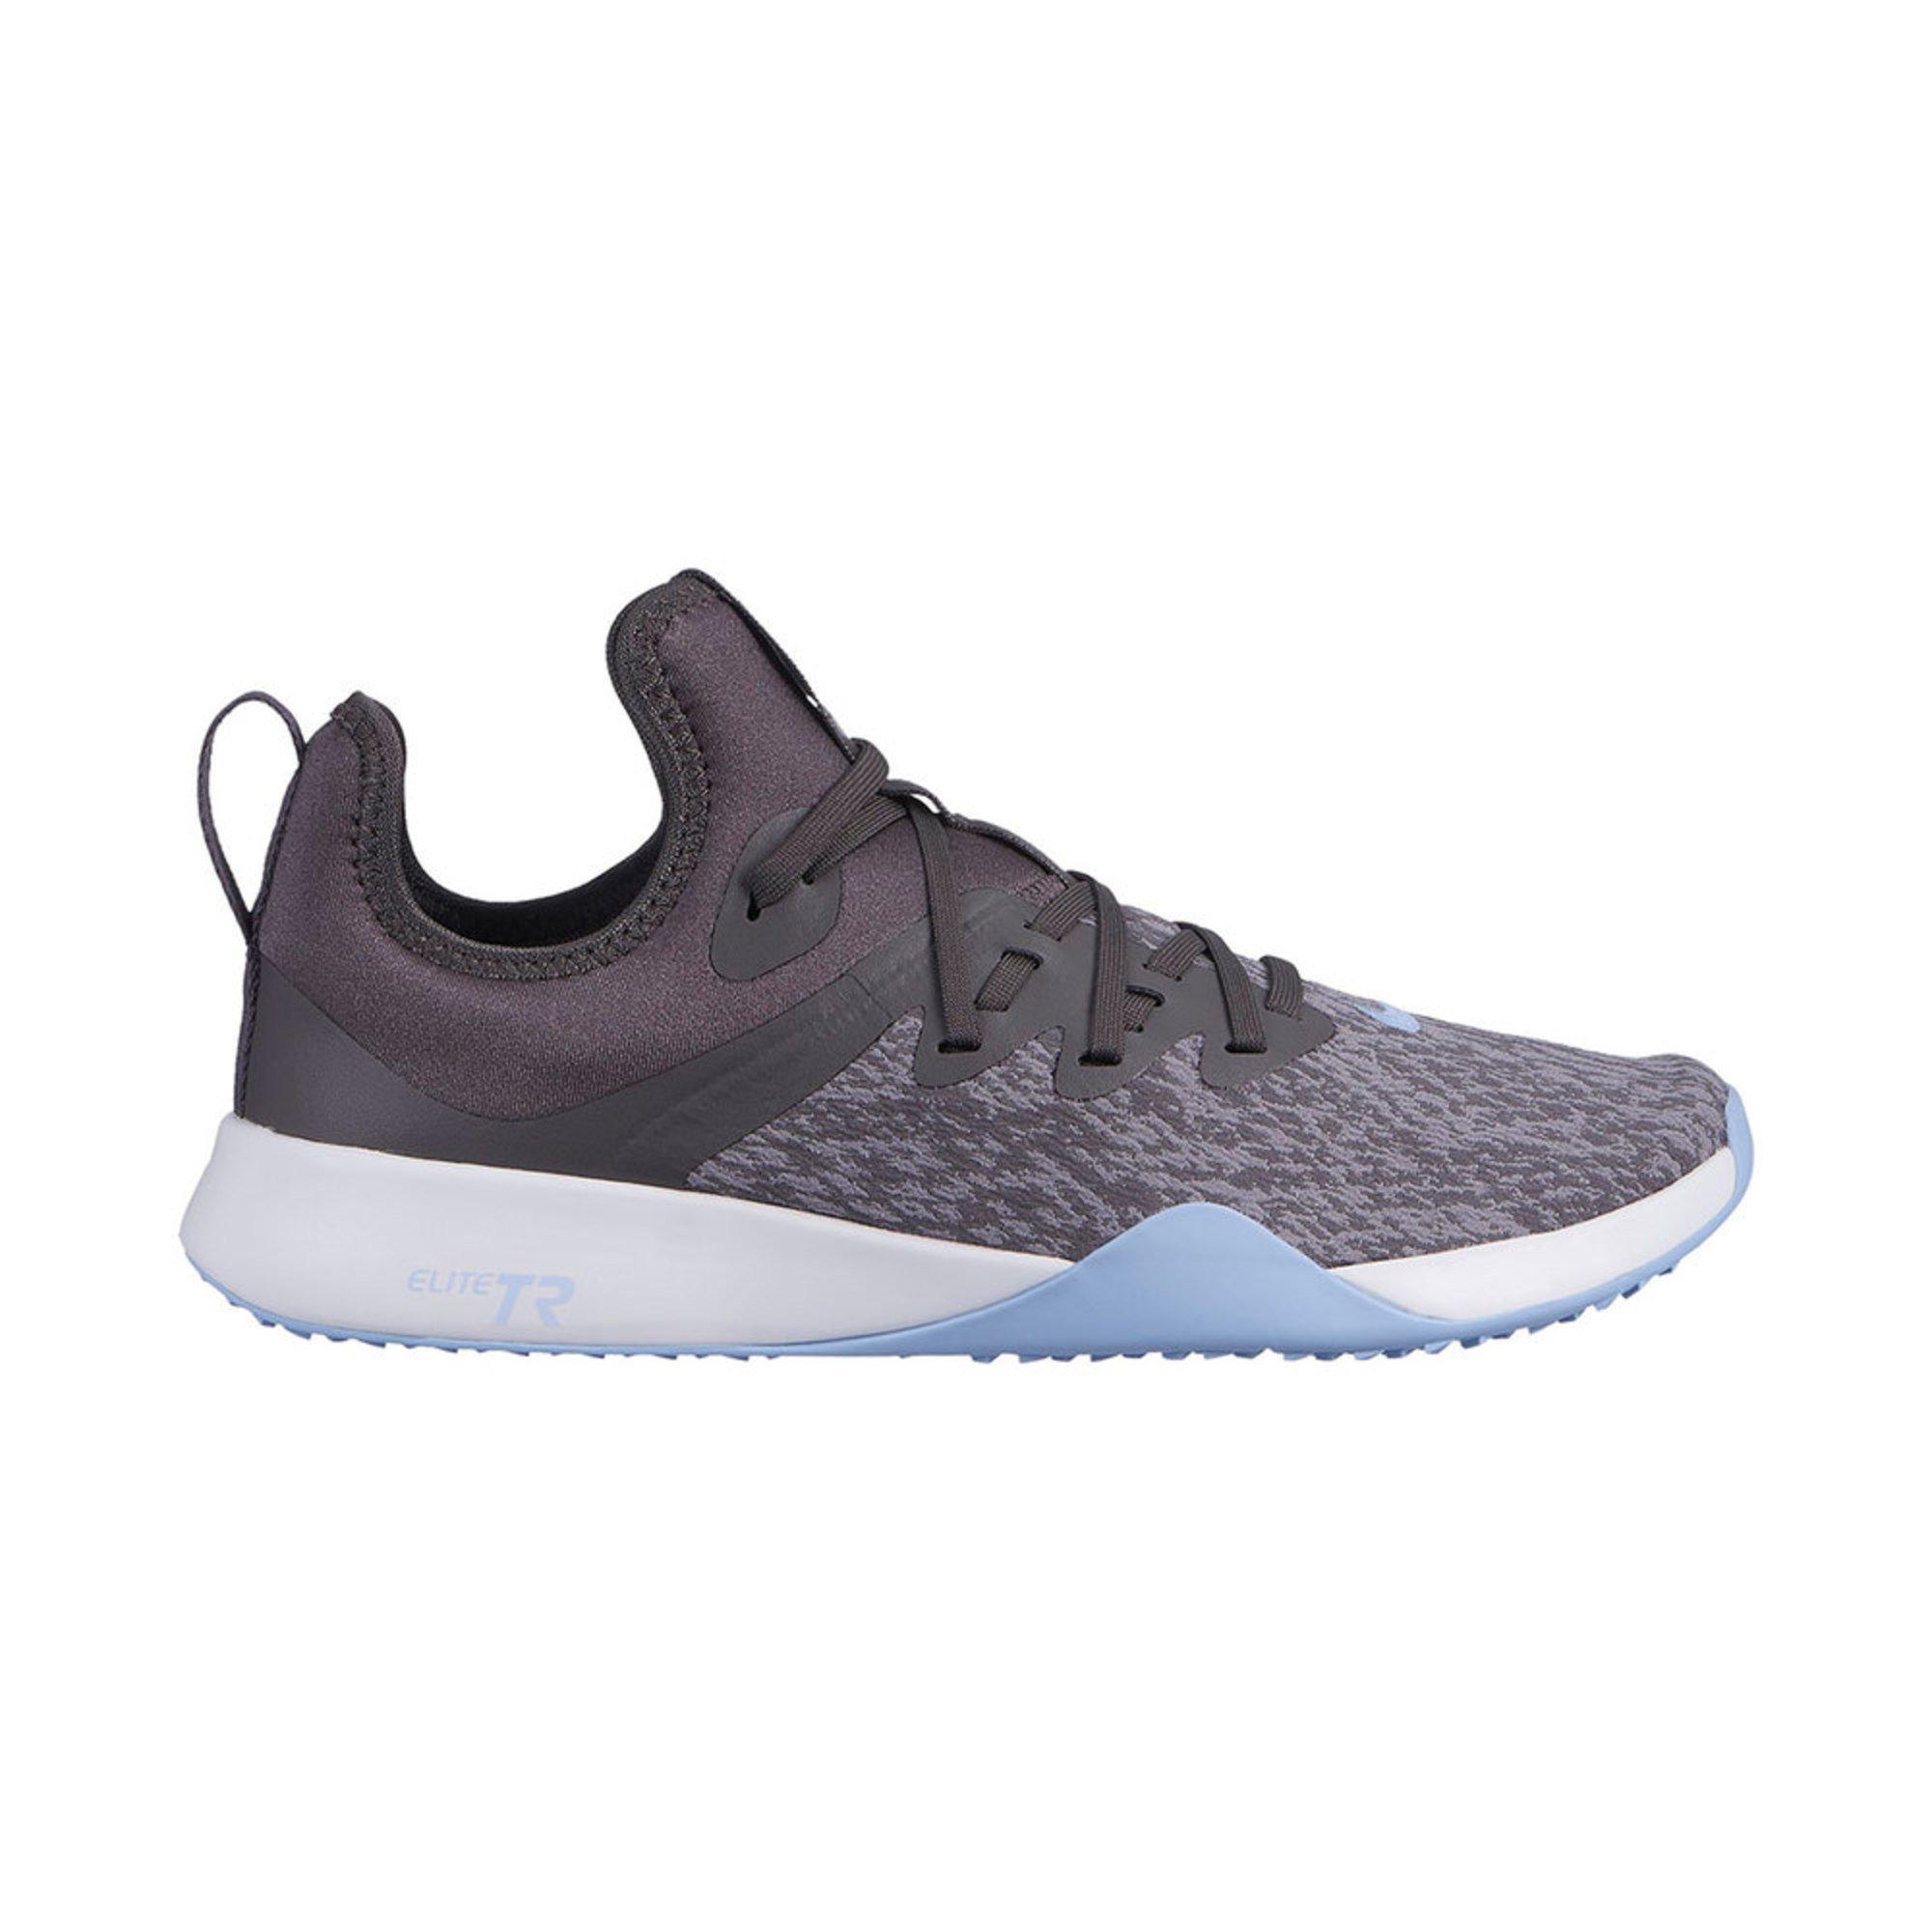 235c25004 Nike Women's Foundation Elite Tr Training Shoe | Women's Training ...